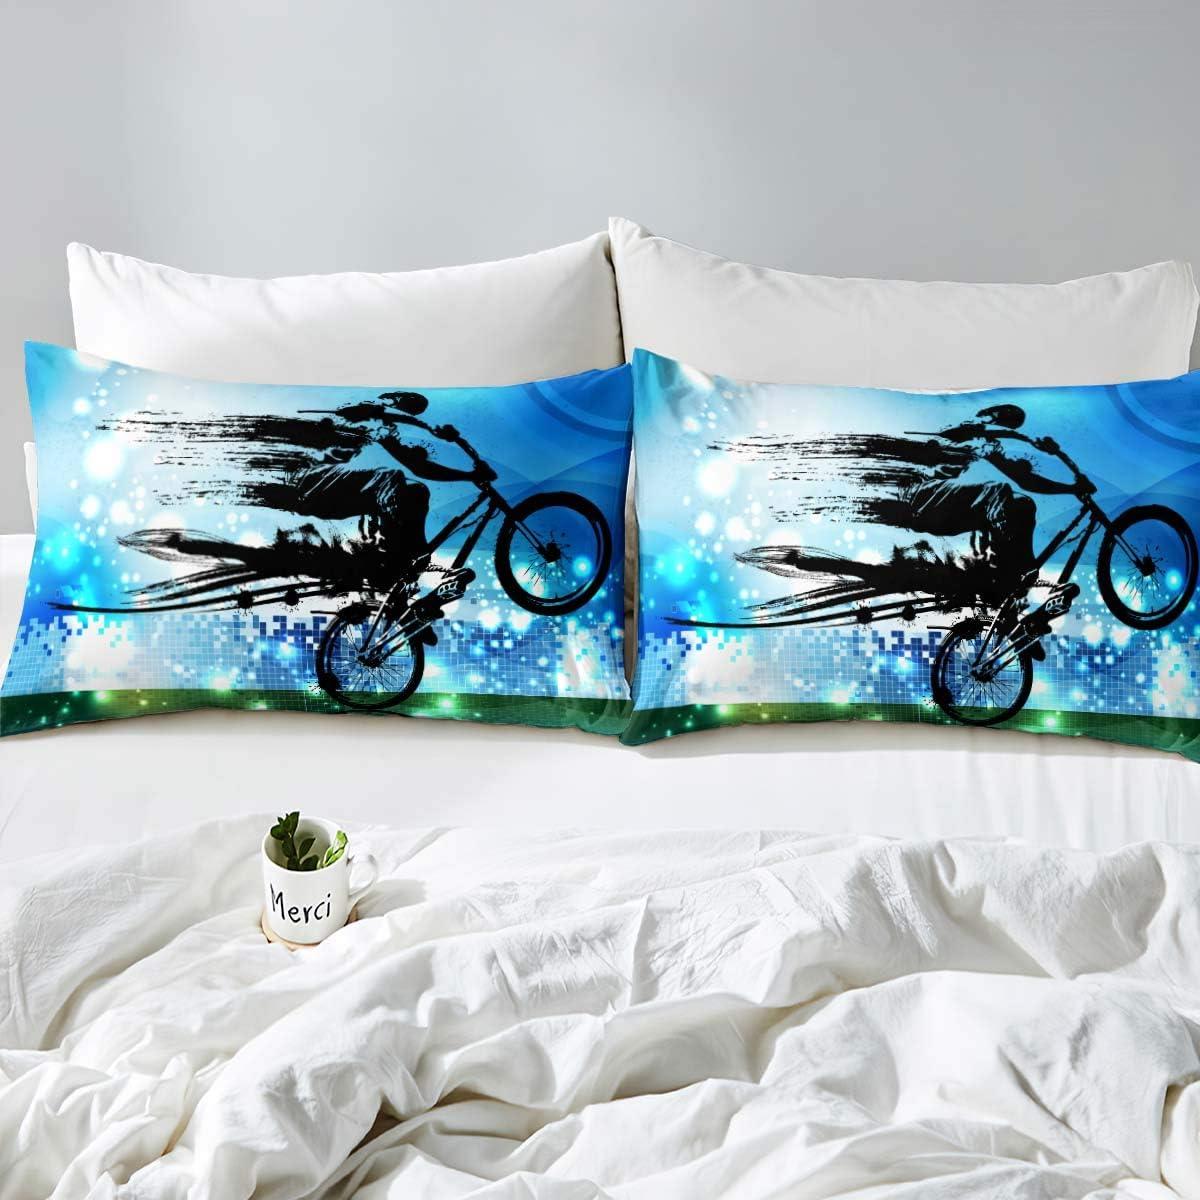 1Duvet Cover +2 Pillowcases Boys Bedding Set,Dirt Bike Sports BMX ...